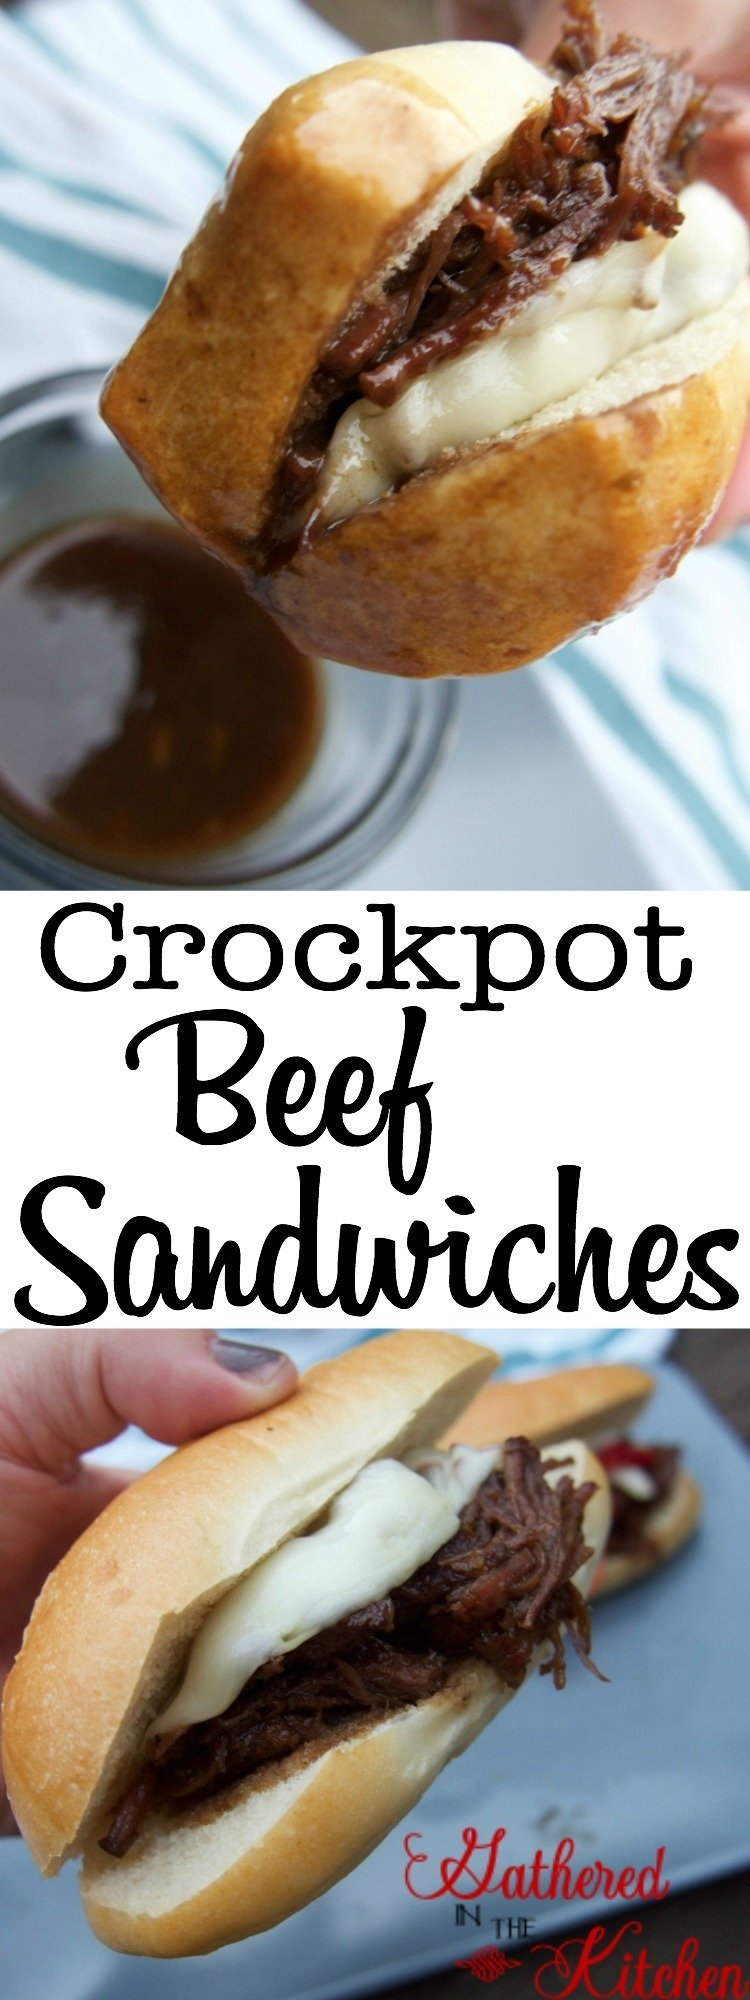 crockpot-beef-sandwiches-1